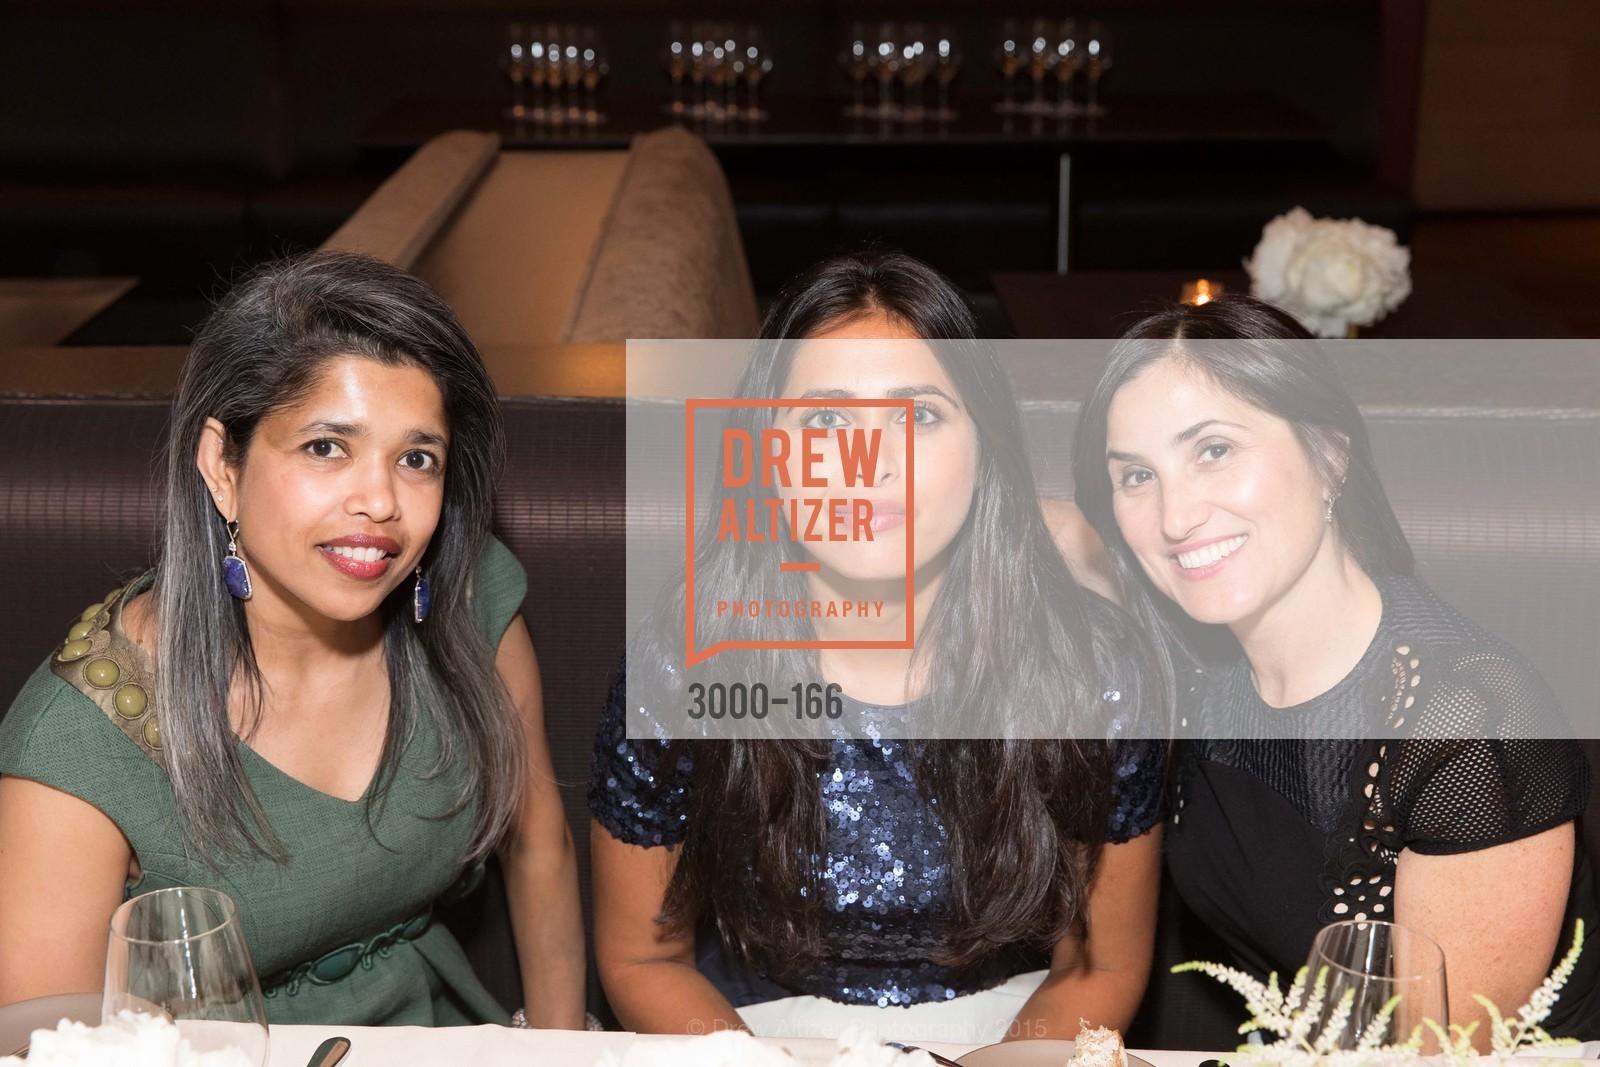 Deepa Pakianathan, Ruzwana Bashir, Zem Joaquin, Photo #3000-166